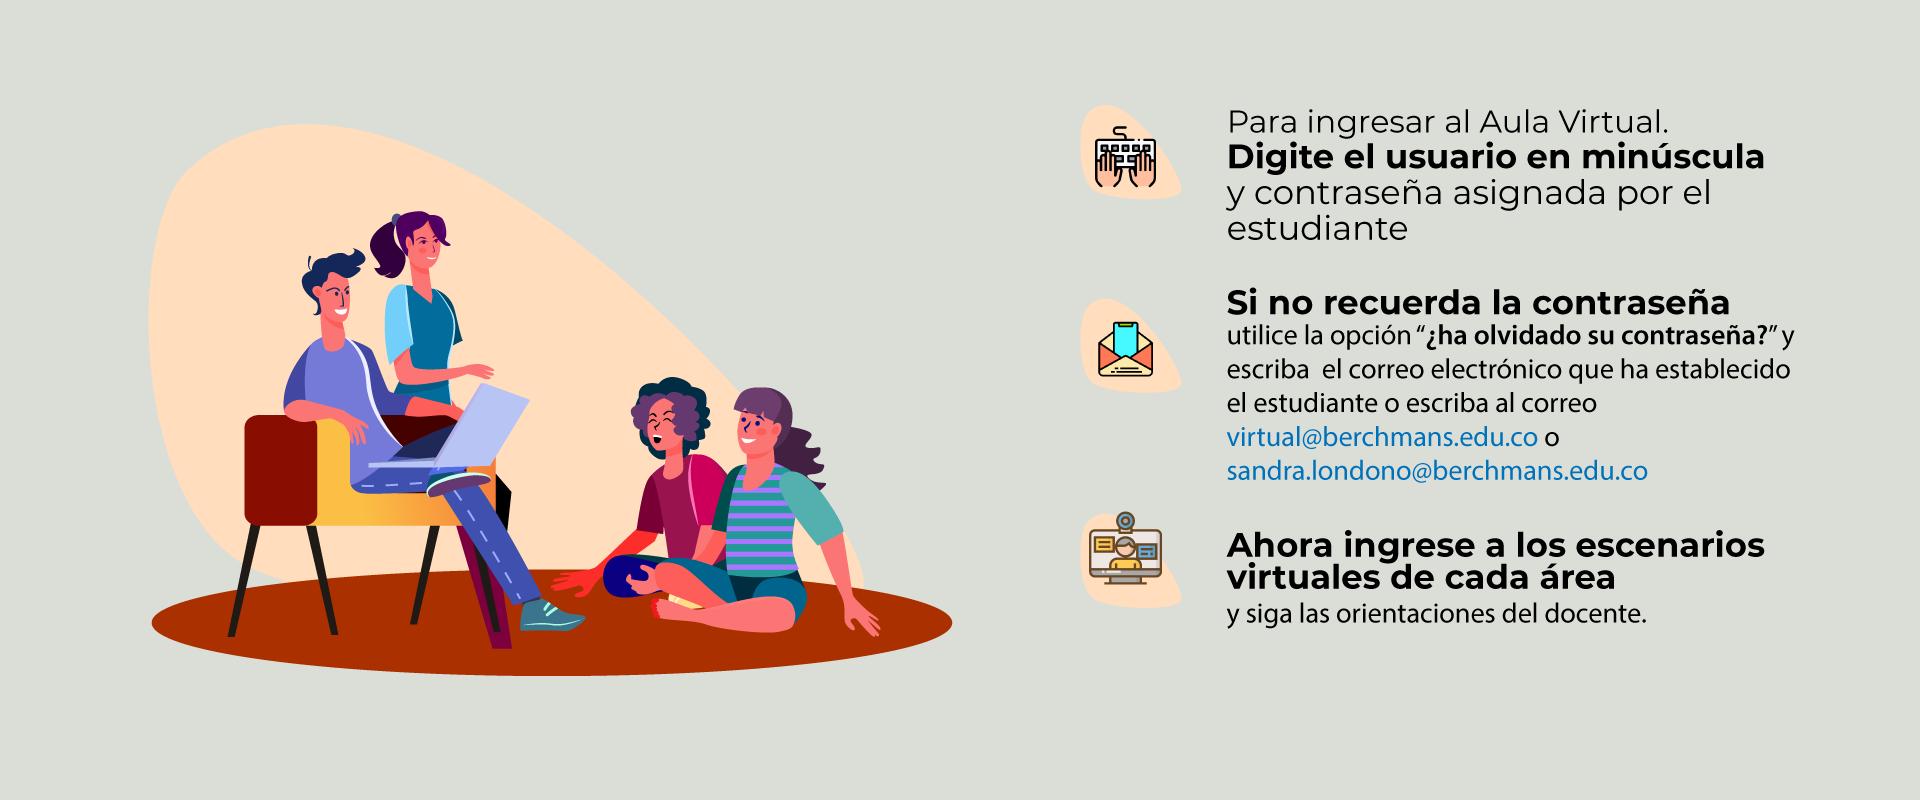 Bienvenidos al Aula Virtual - Bachillerato